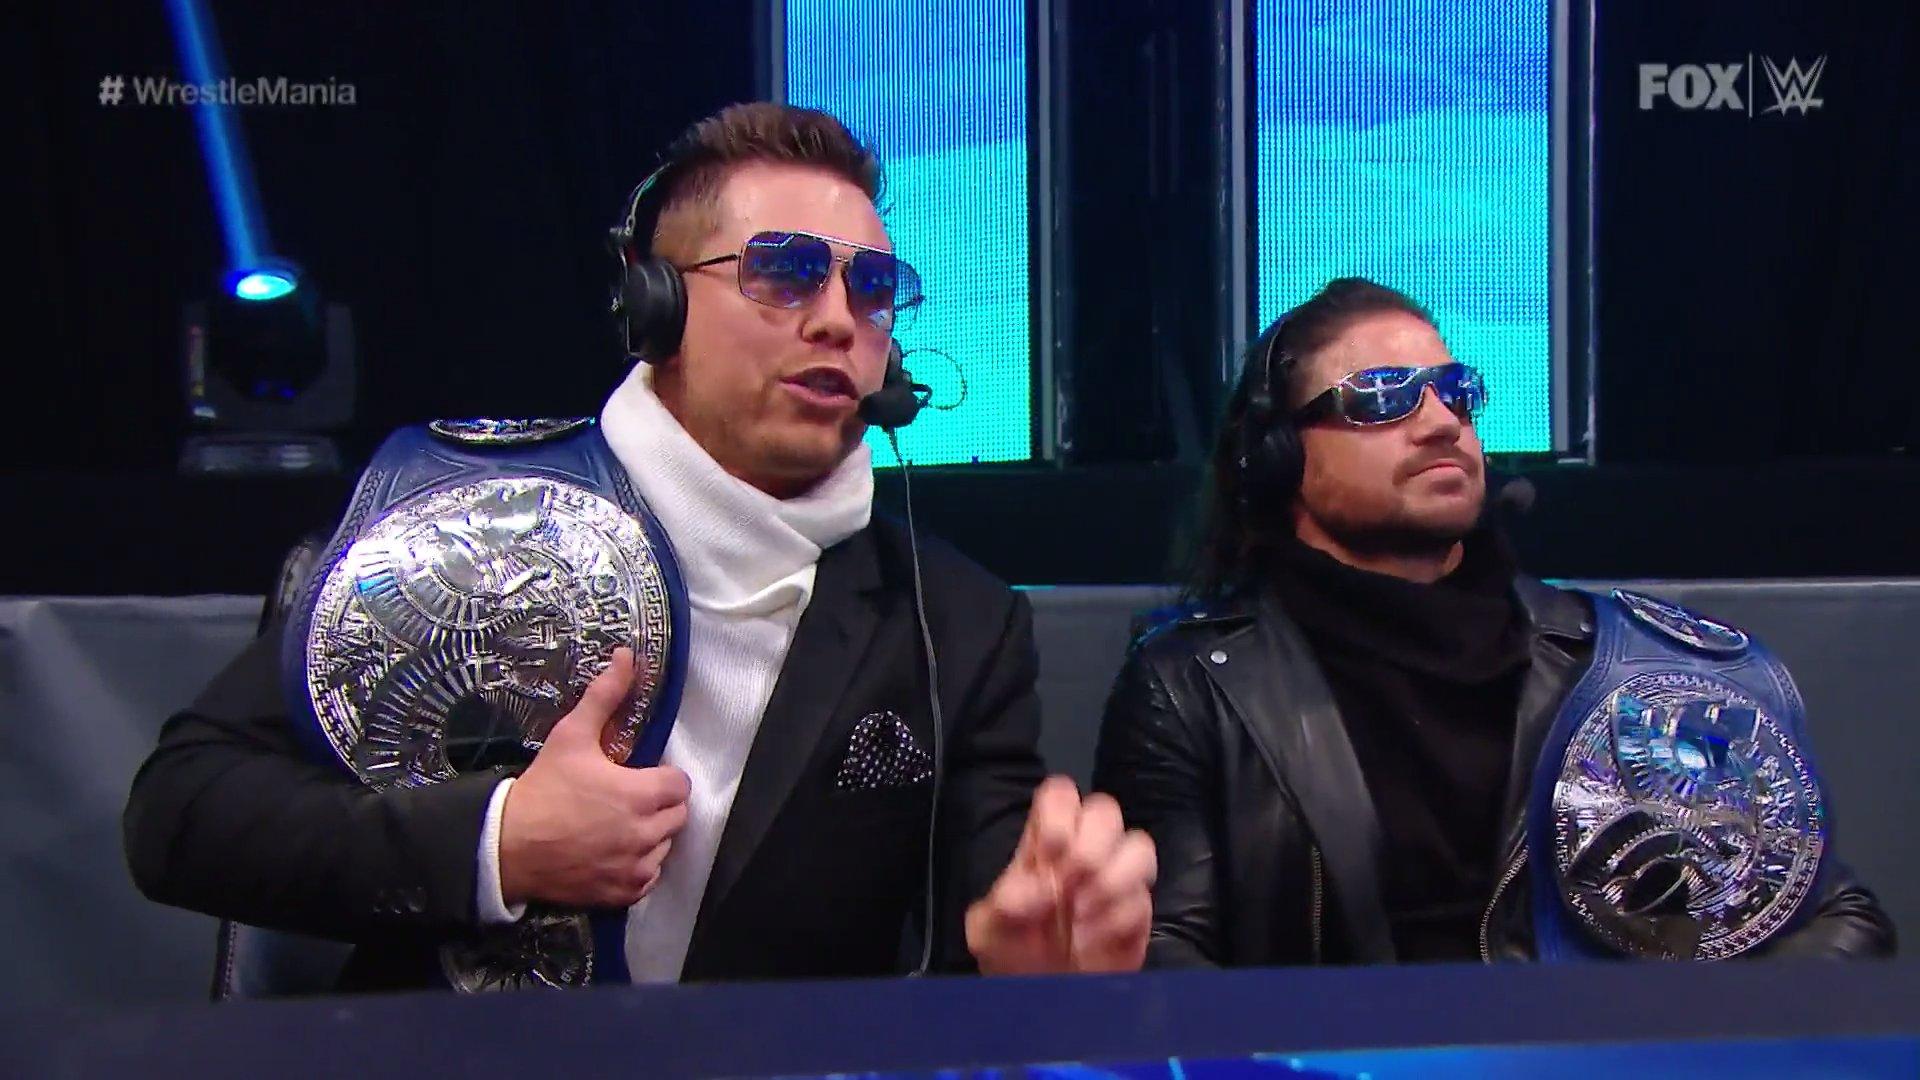 WWE SMACKDOWN (27 de marzo 2020)   Resultados en vivo   Drew Gulak vs. Shinsuke Nakamura 24